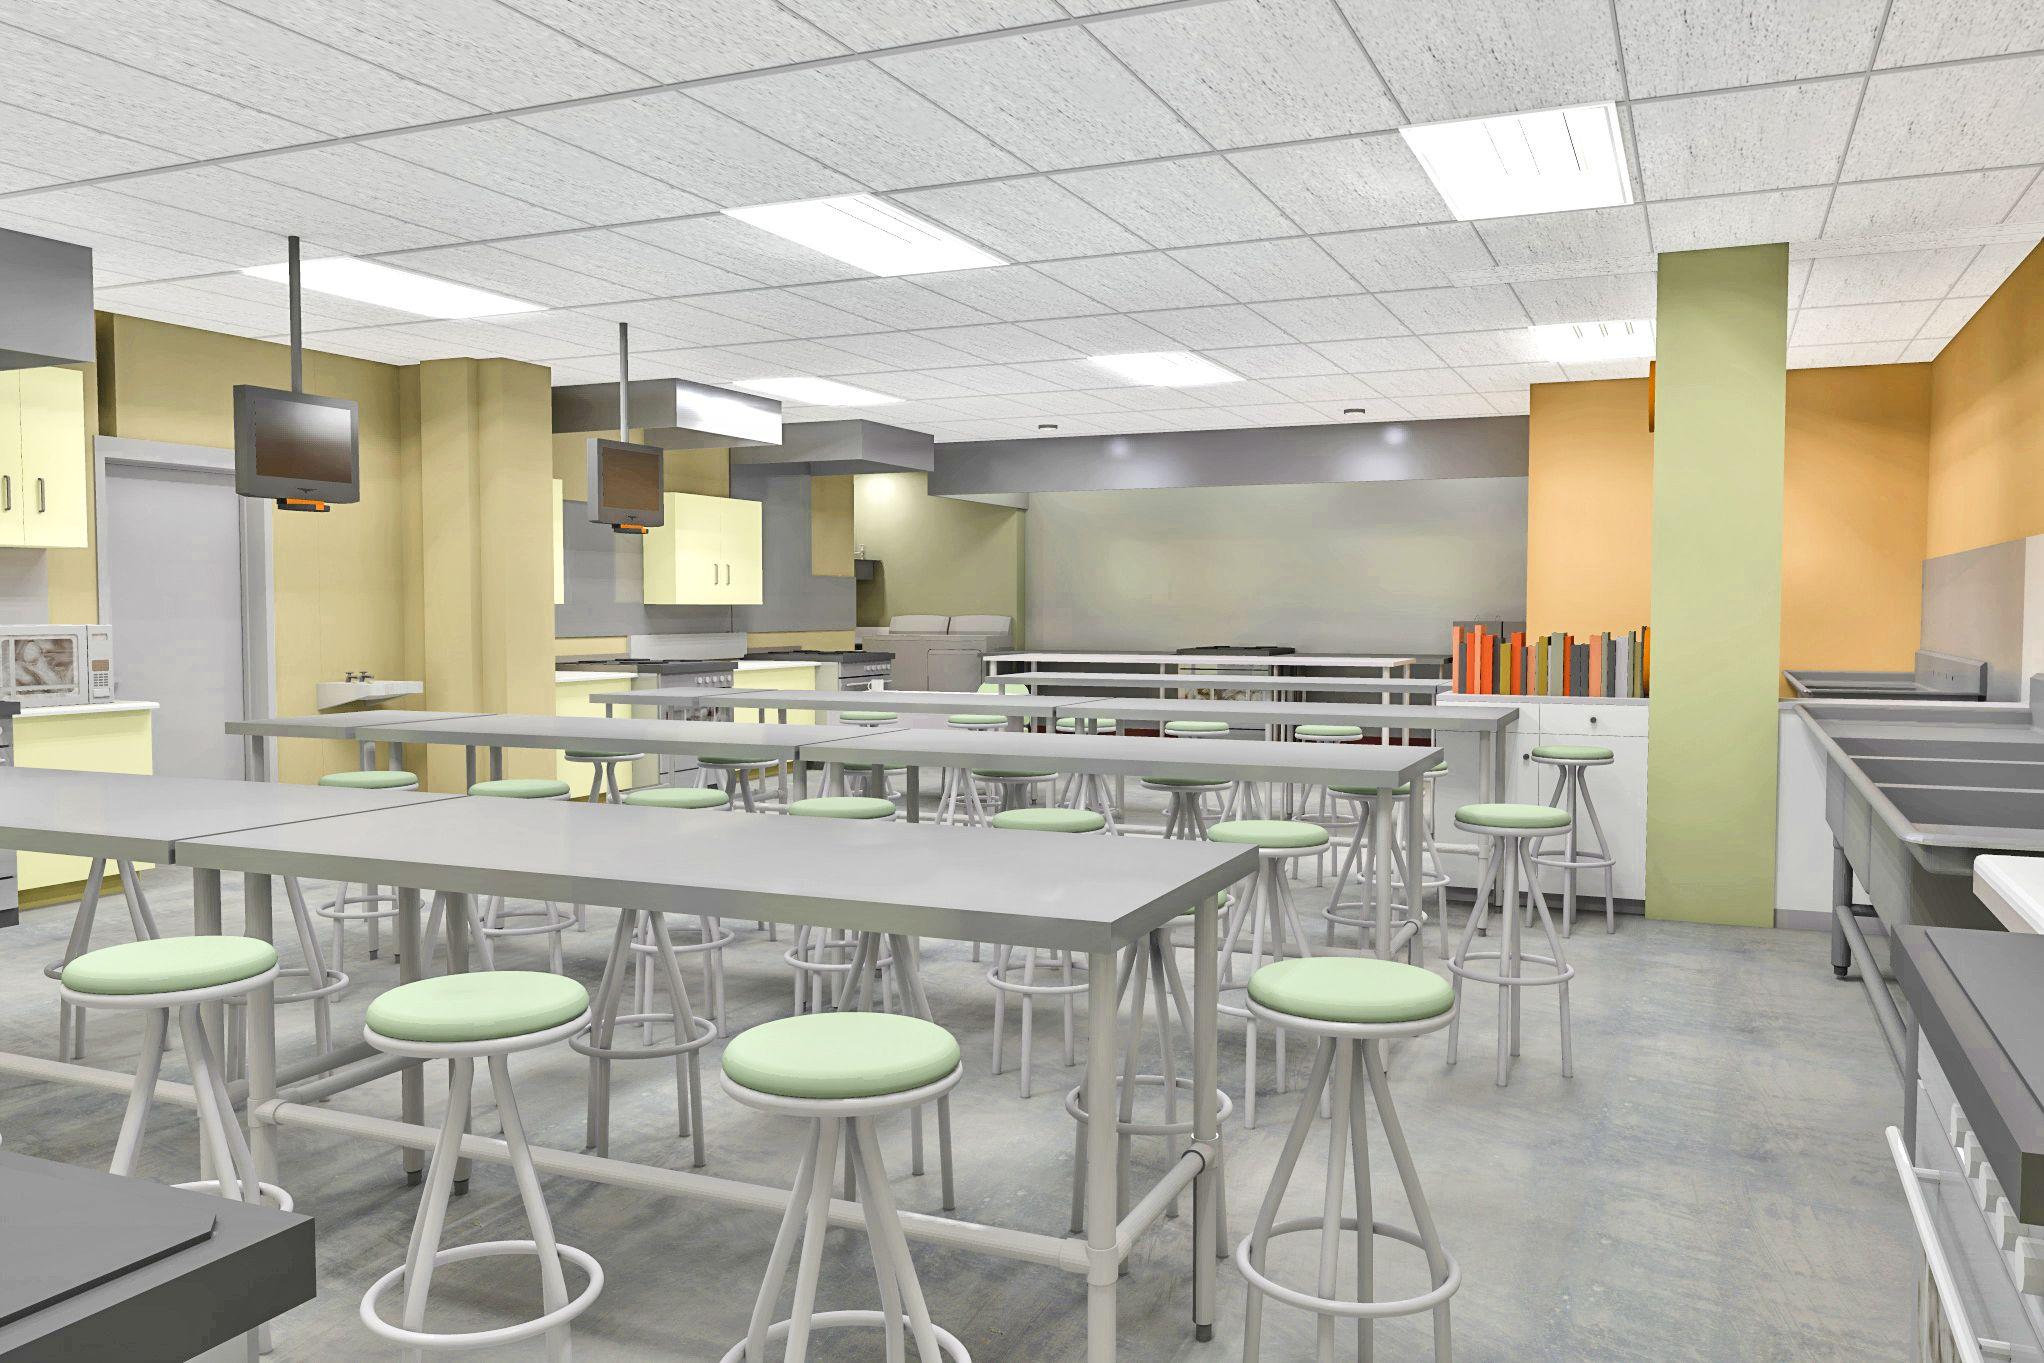 Teaching Kitchen Design art classrooms designs   image hostedphotobucket   art